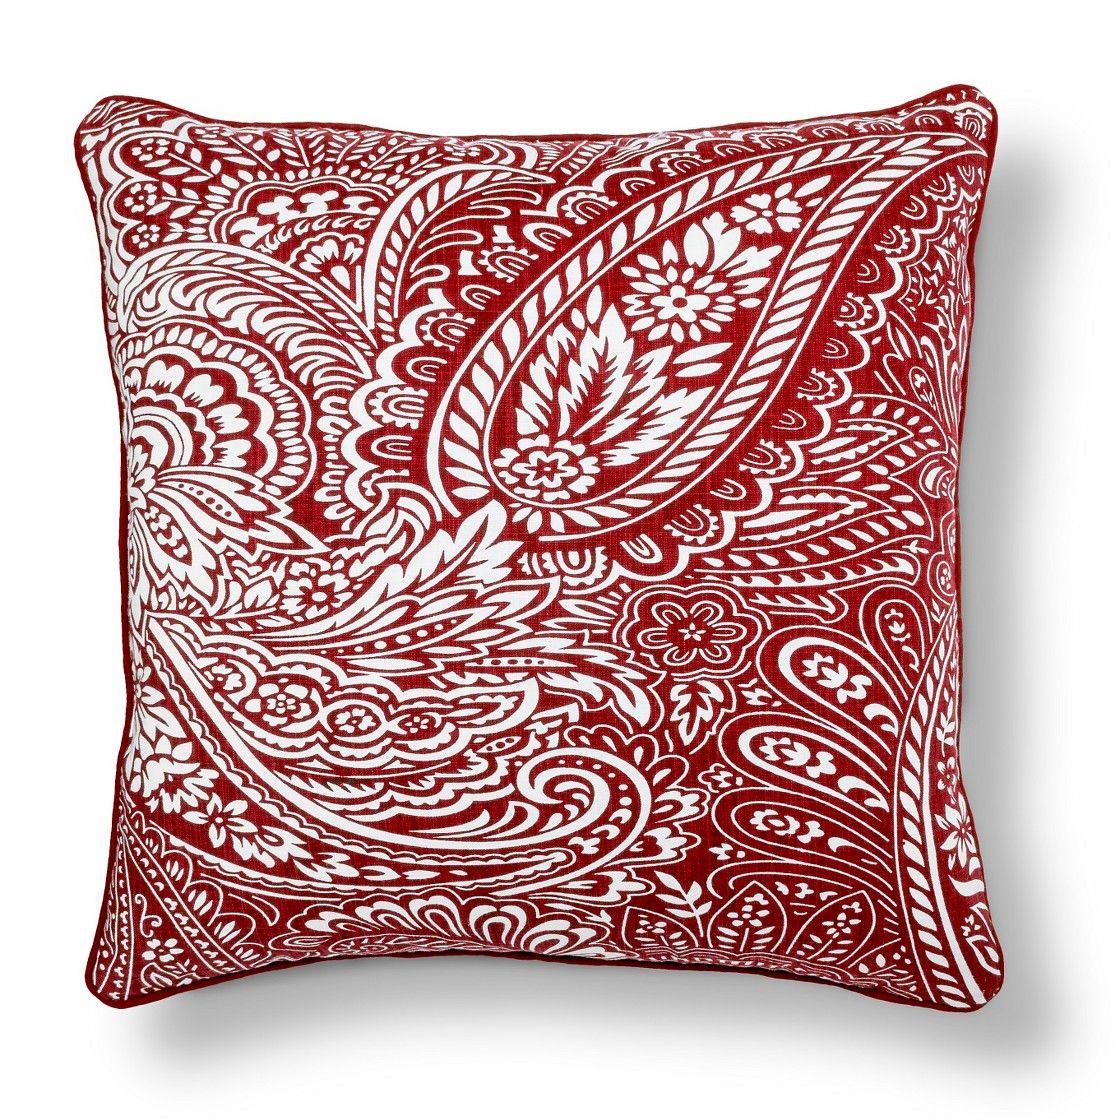 Threshold  Paisley Decorative Pillow | Pillows | Pinterest | Pillows, Throw  Pillows And Decorating